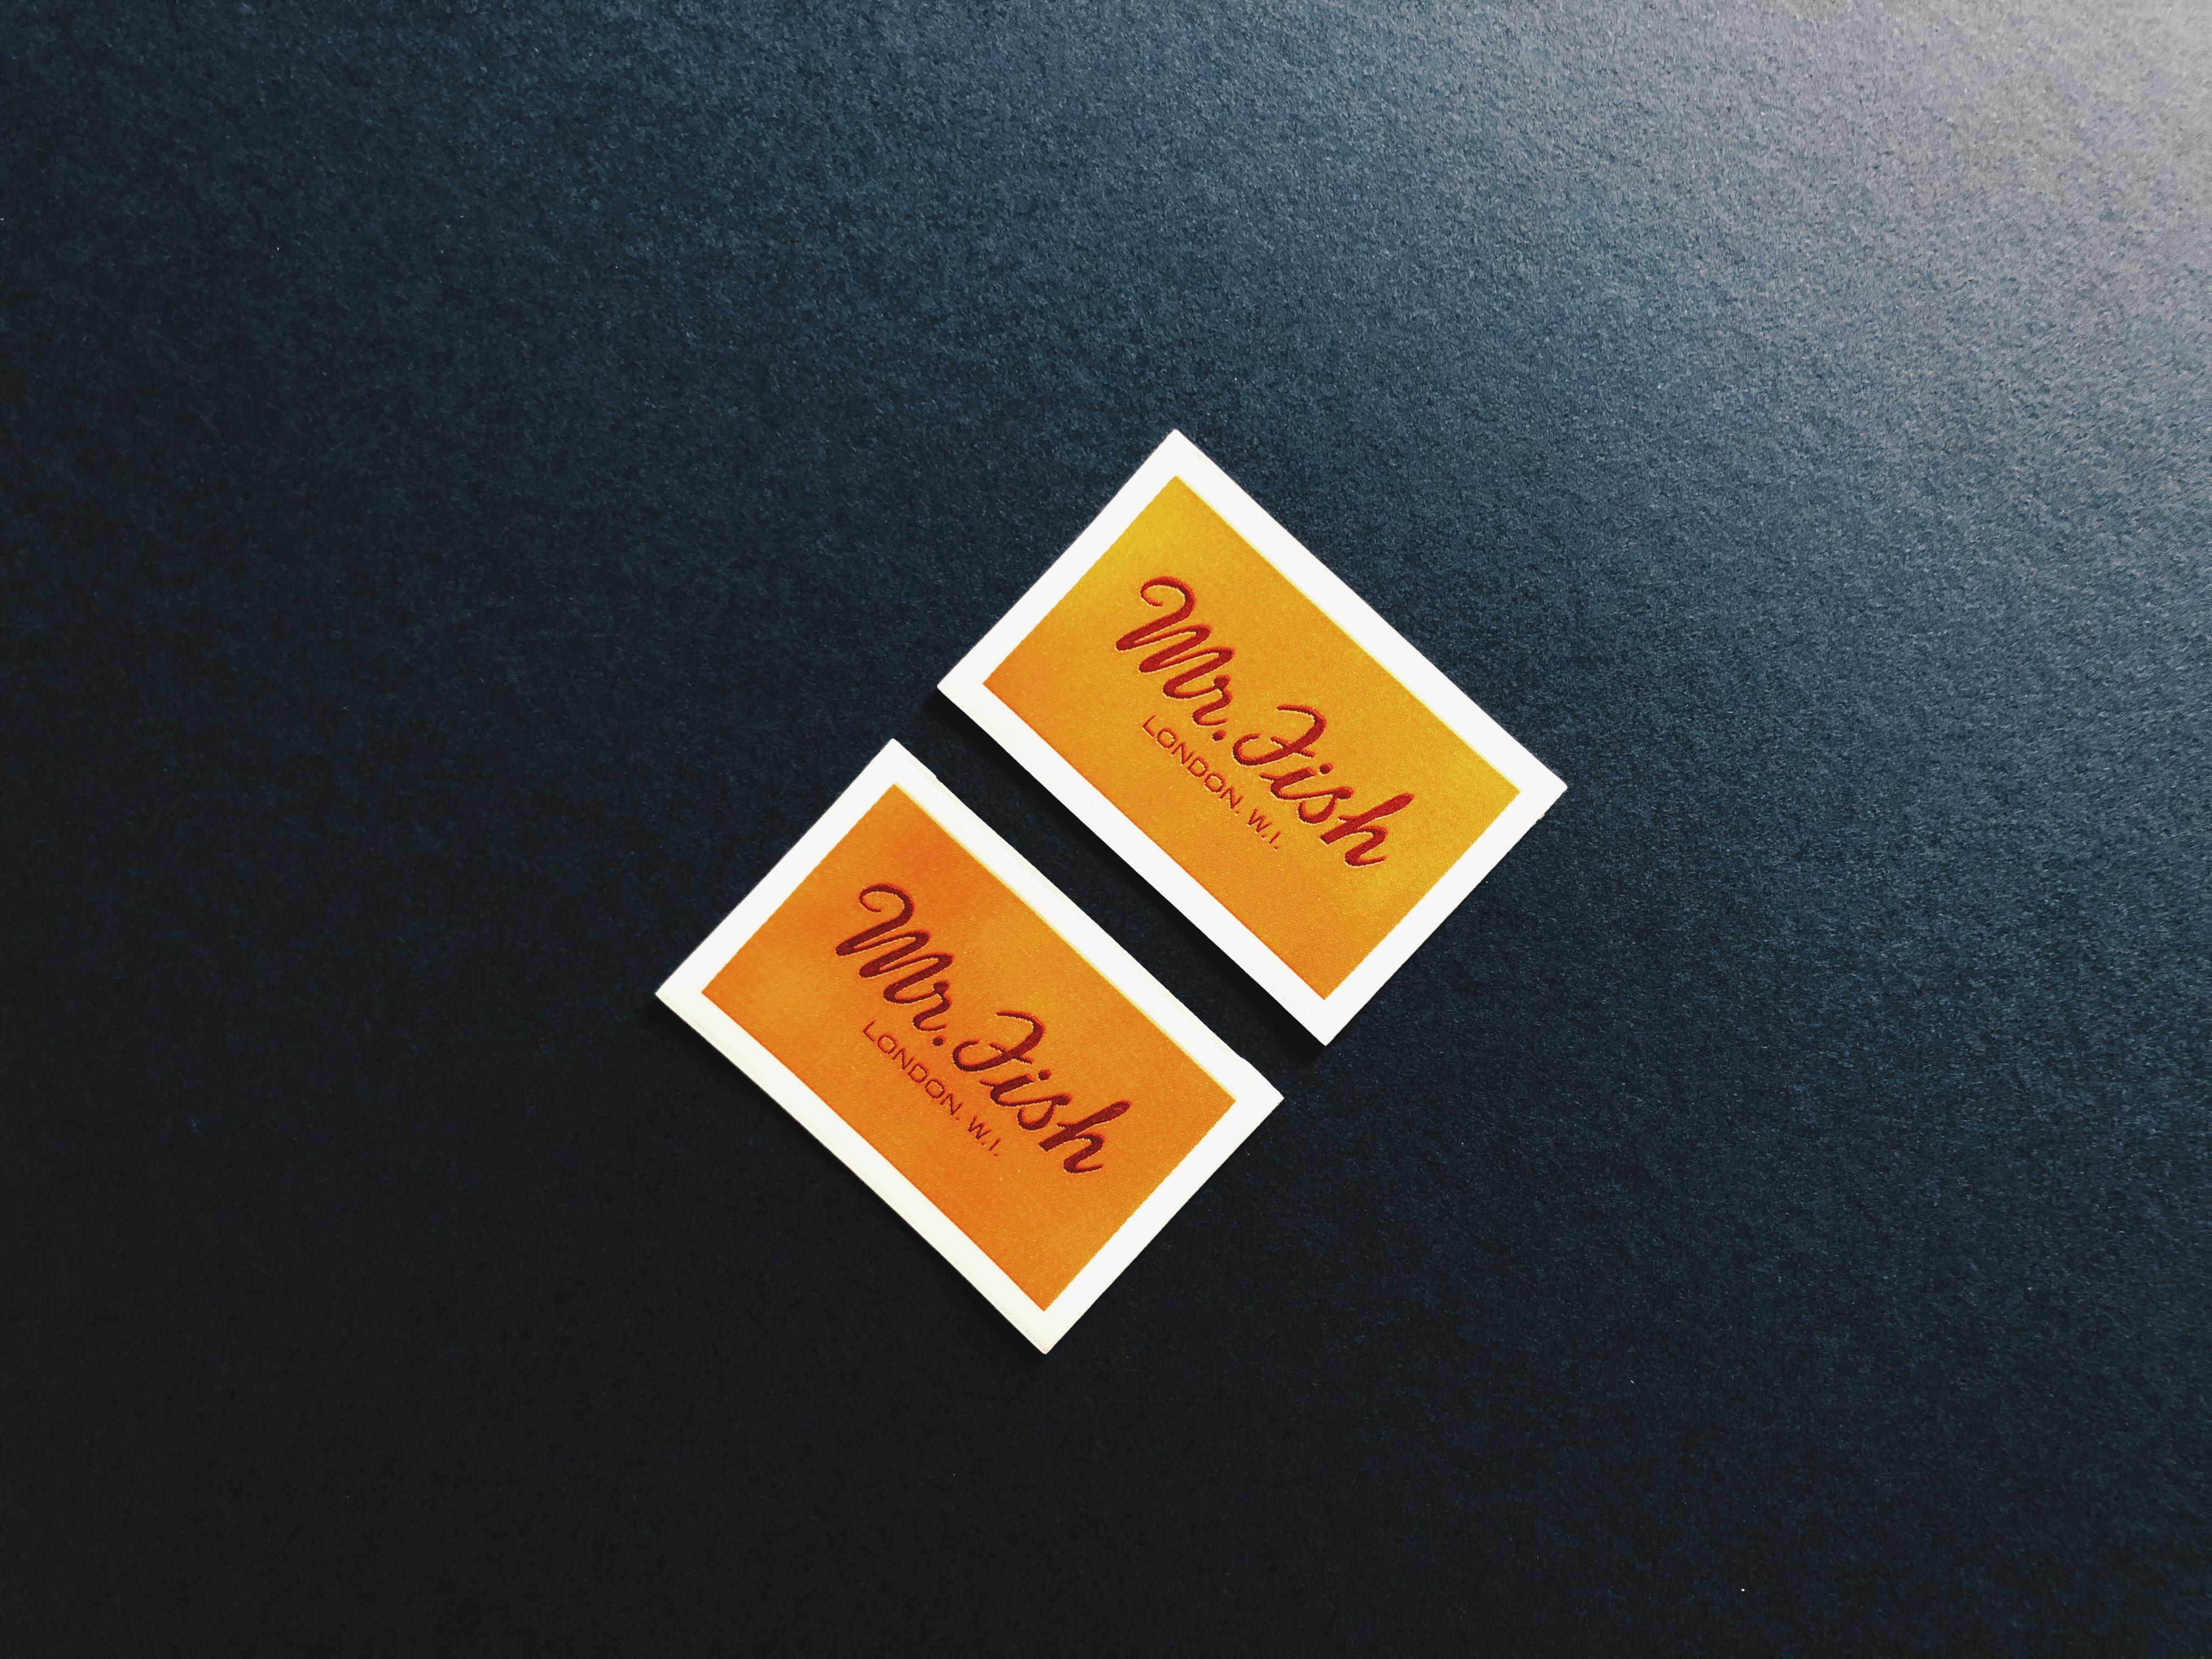 New Work — Coming Soon.Mr Fish — Labelling + Packaging.#Brand #Branding #Design #Graphicdesign #British #logo #logos #brands #NewRelease #contemporary #dorset #london #graphicdesigner #graphicdesign #designagency #brandingagency #fashion #malefashion #mensfashion #packagingdesign #packaging #mayfair #savillerow #london #lifestyle #rakish